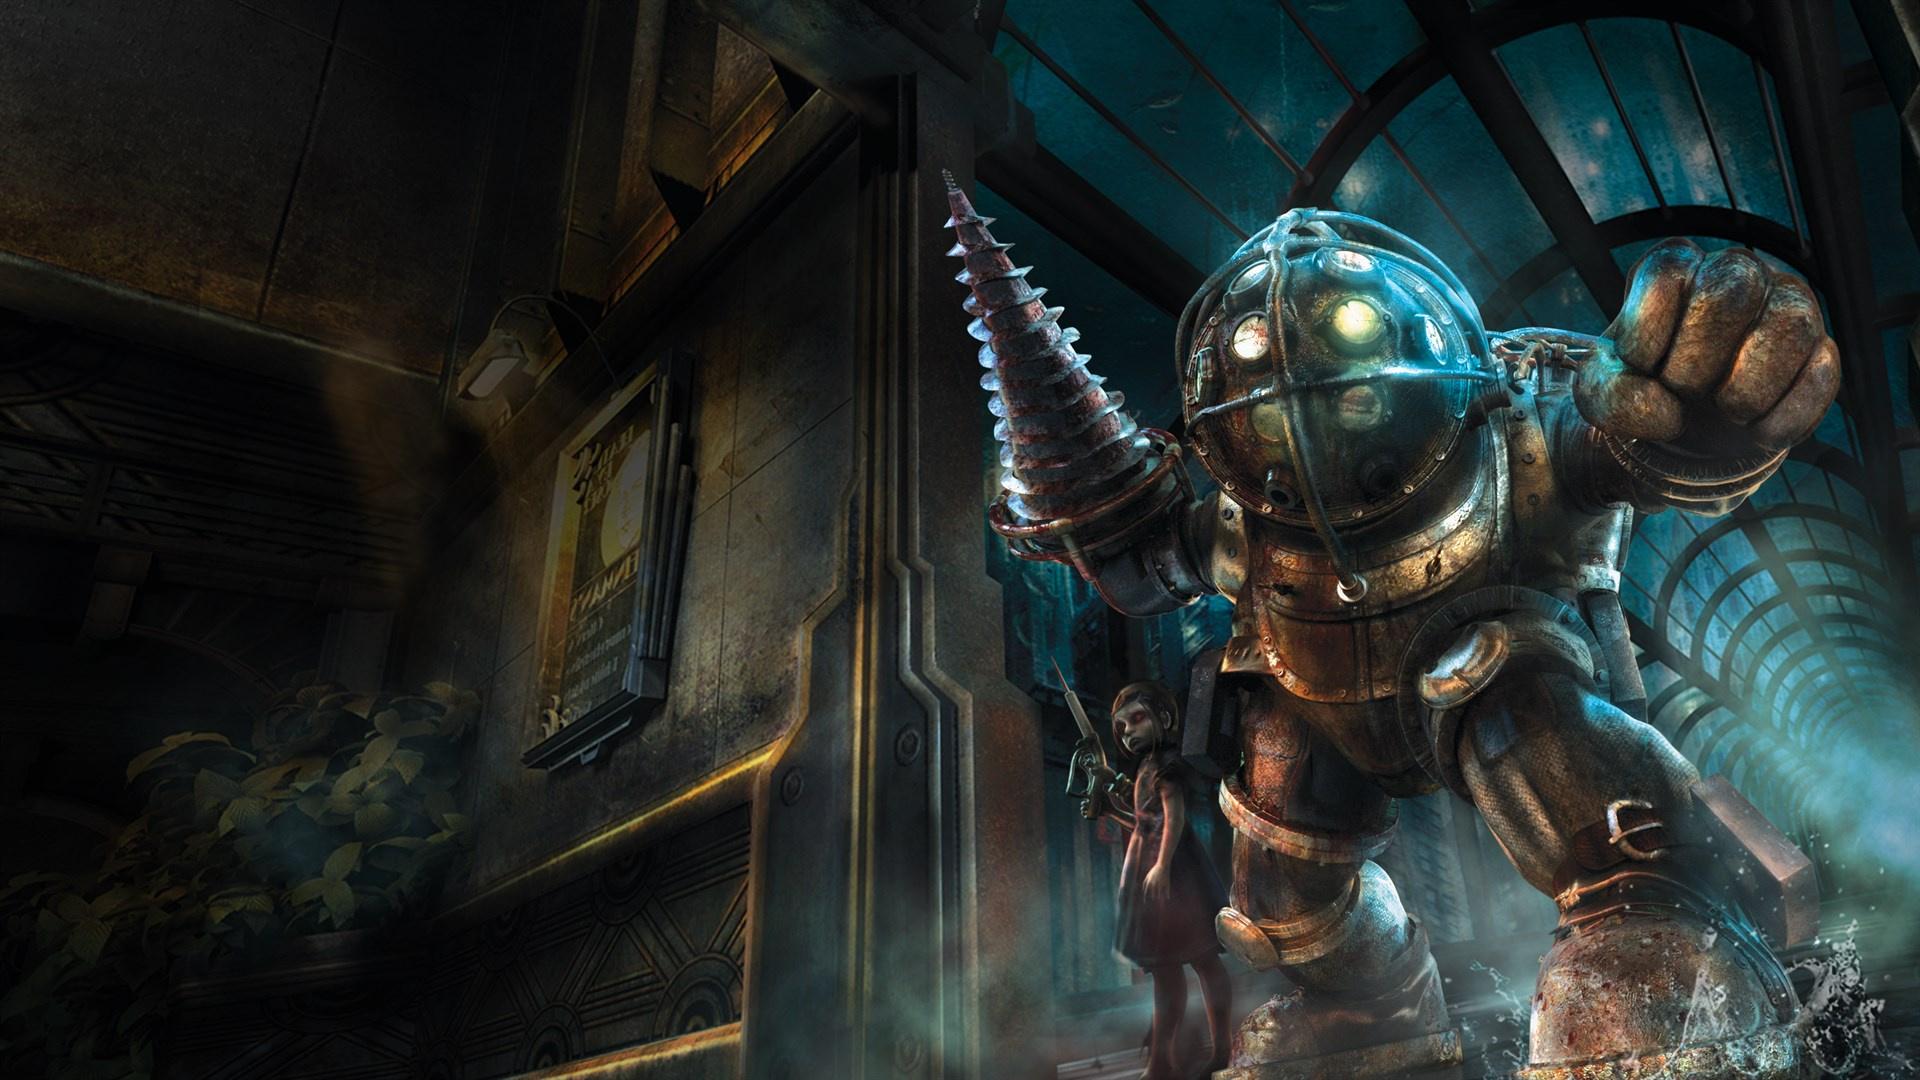 Новый Humble Bundle: BioShock Remastered, Euro Truck Simulator2, Titan Quest и другие